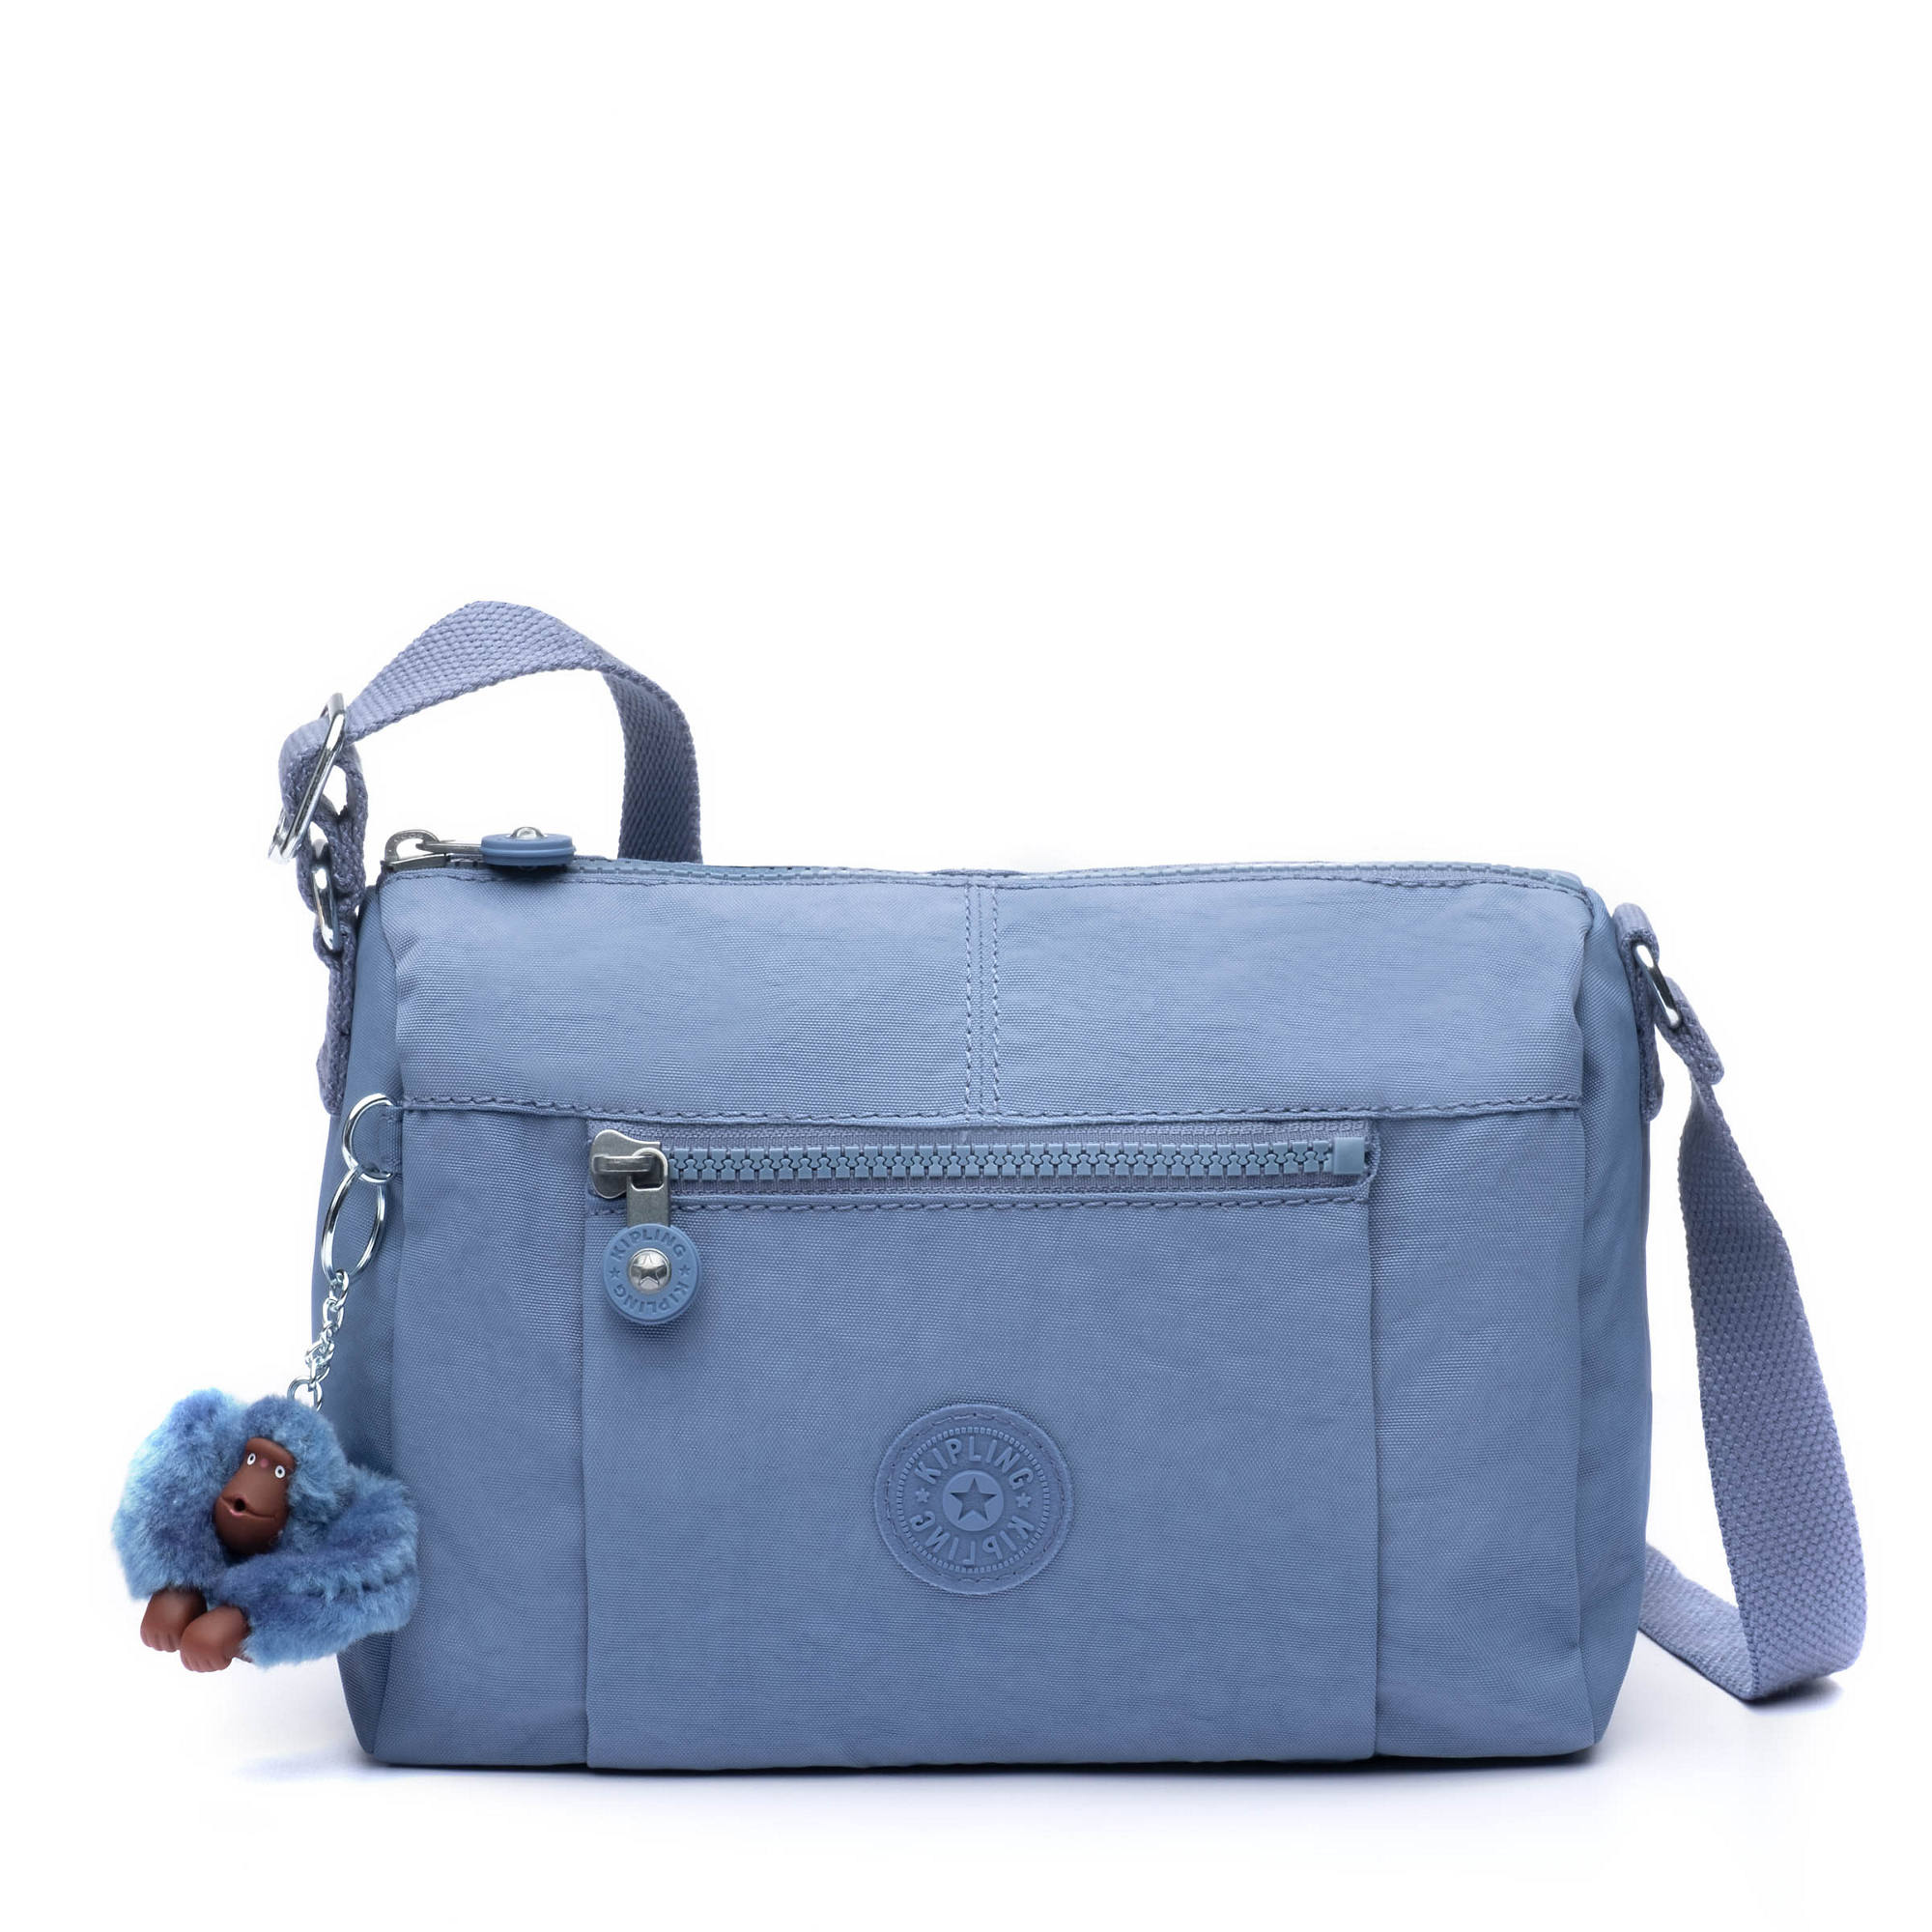 Wes Crossbody Bag,Blue Buzz,large-zoomed